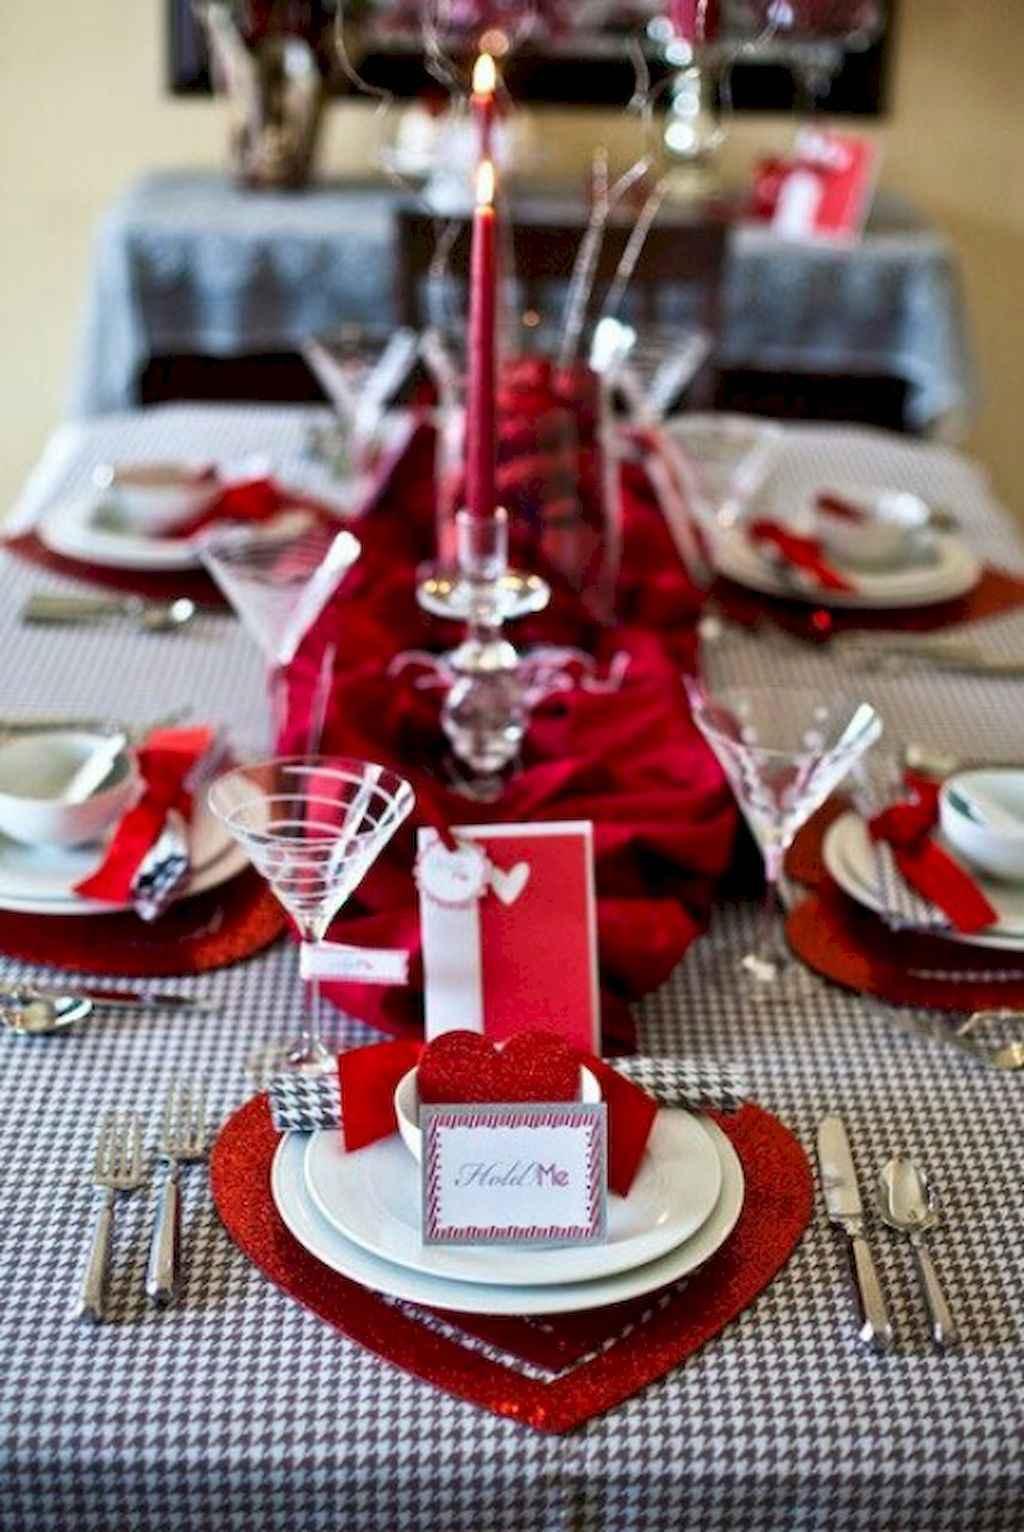 66 Romantic Valentines Table Settings Decor Ideas (39)